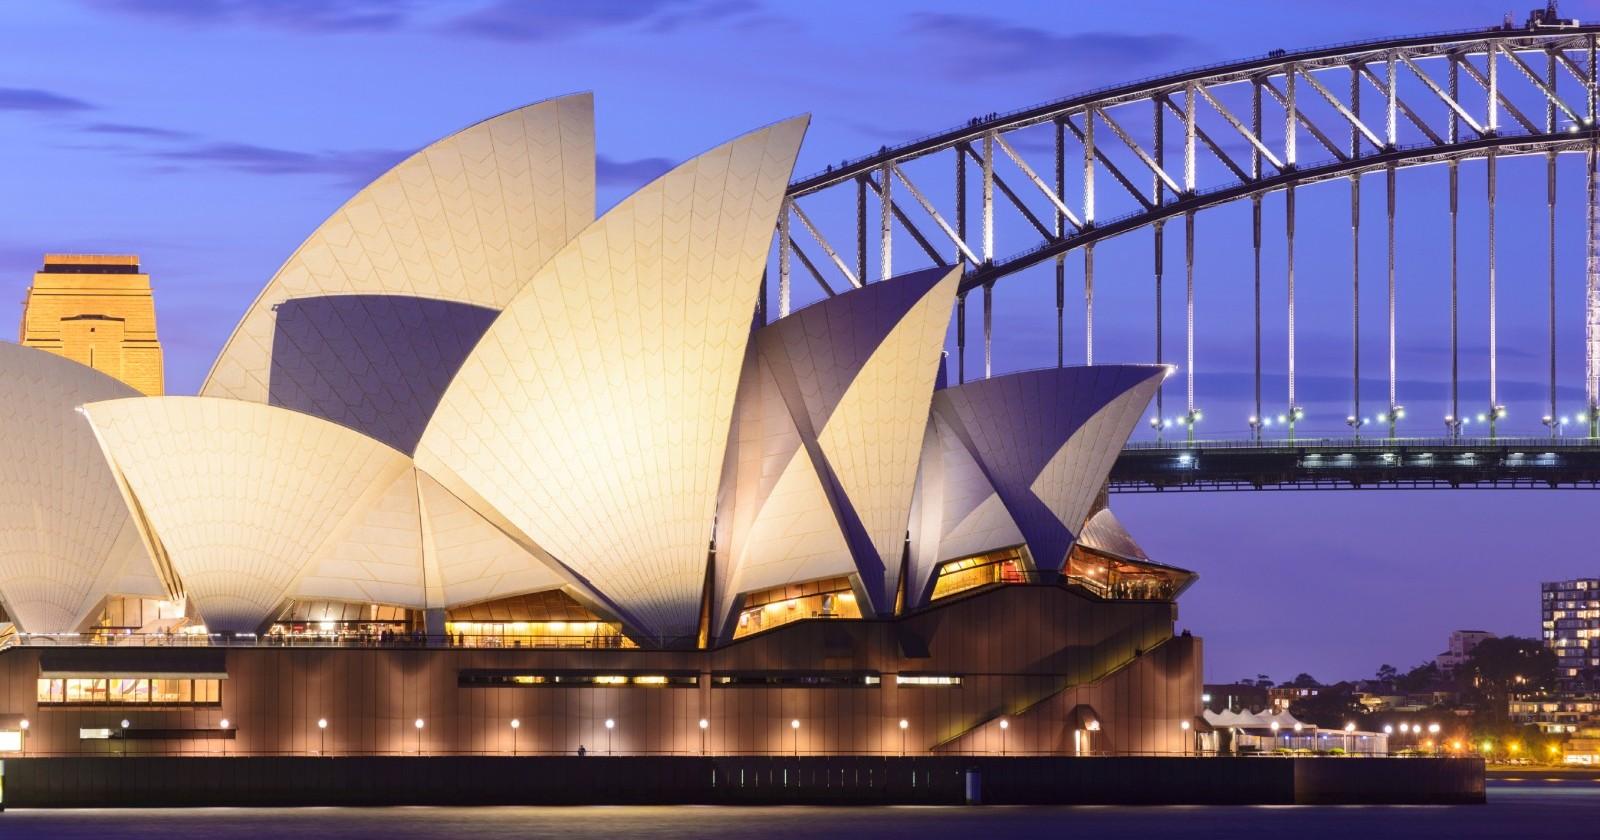 Signal in Australia: Scaling Customer Identity through Collaboration